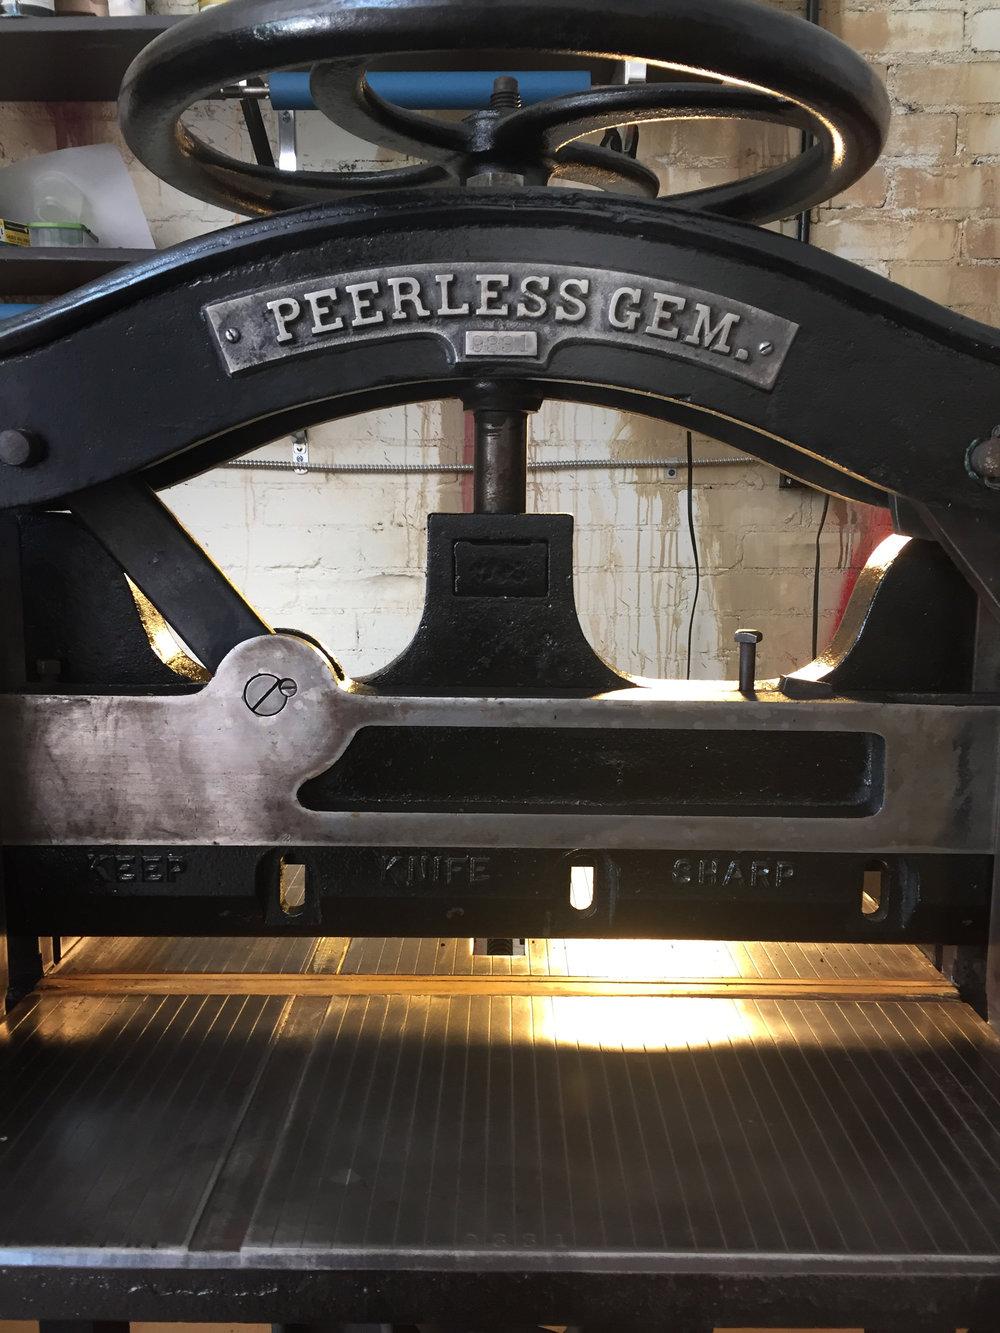 letterpress, gem peerless